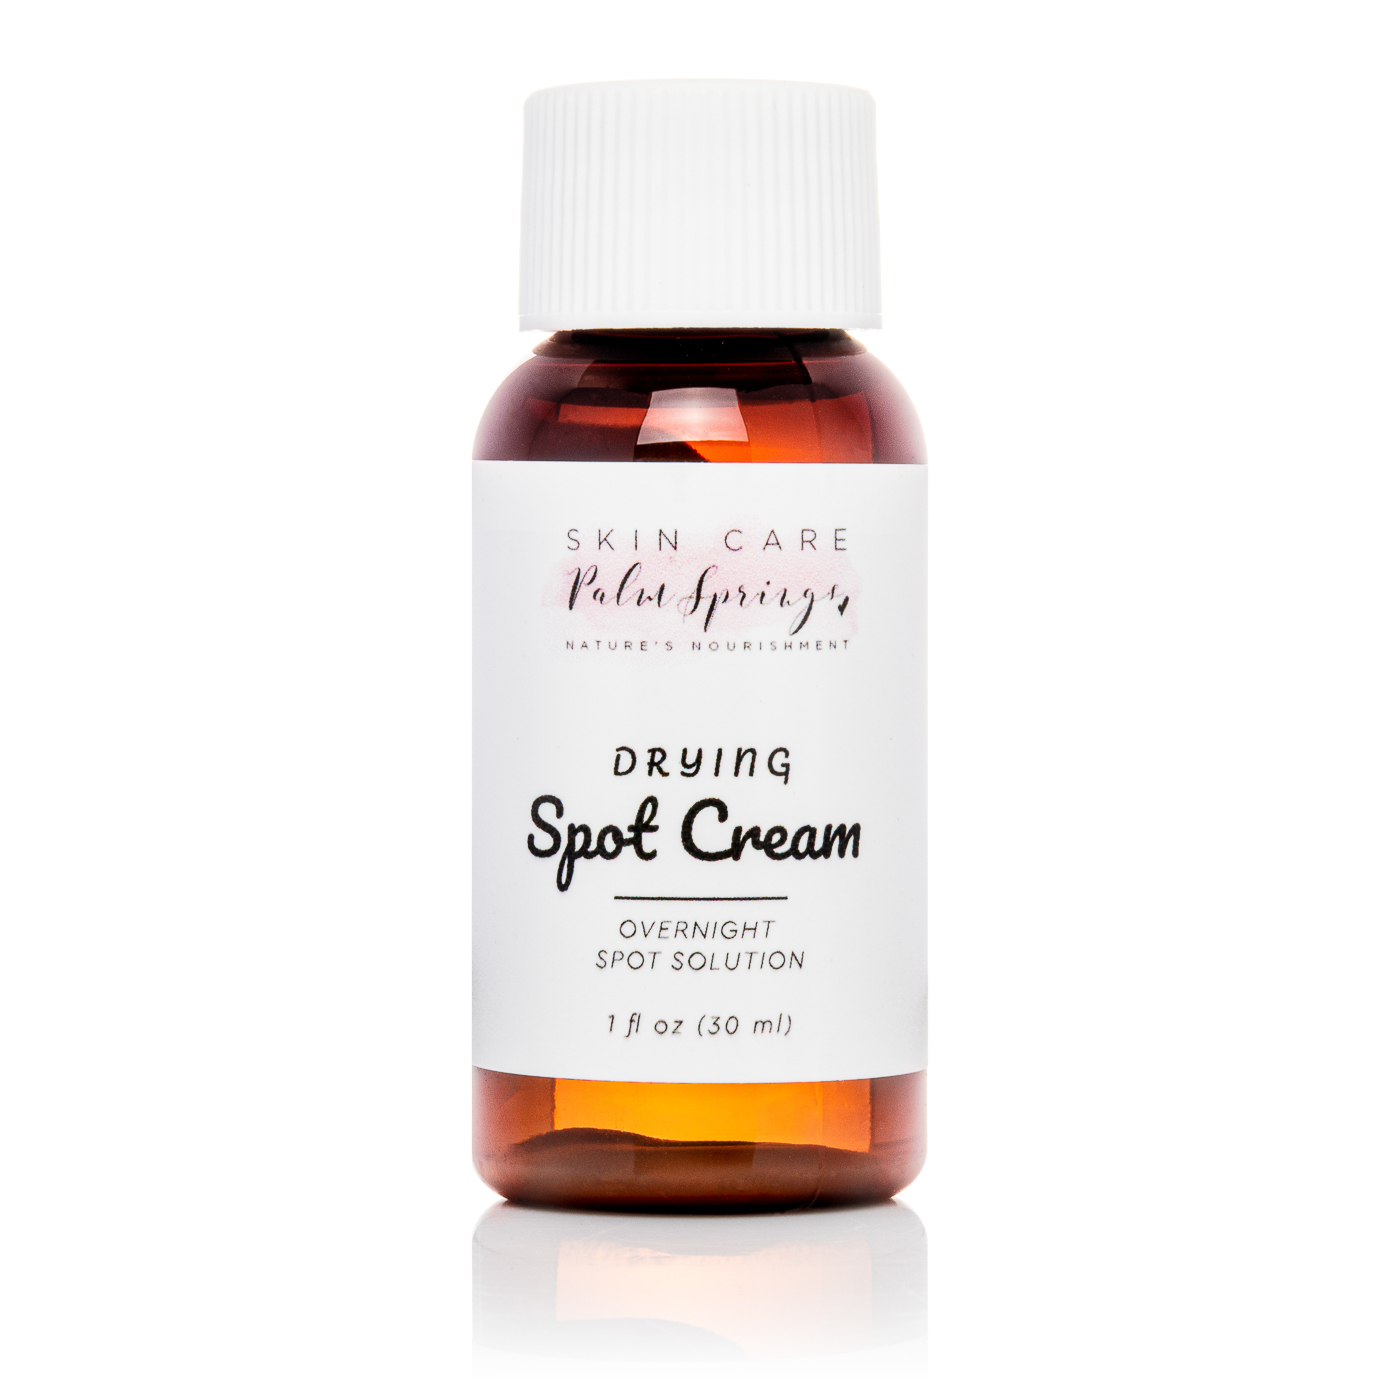 Drying Spot Cream